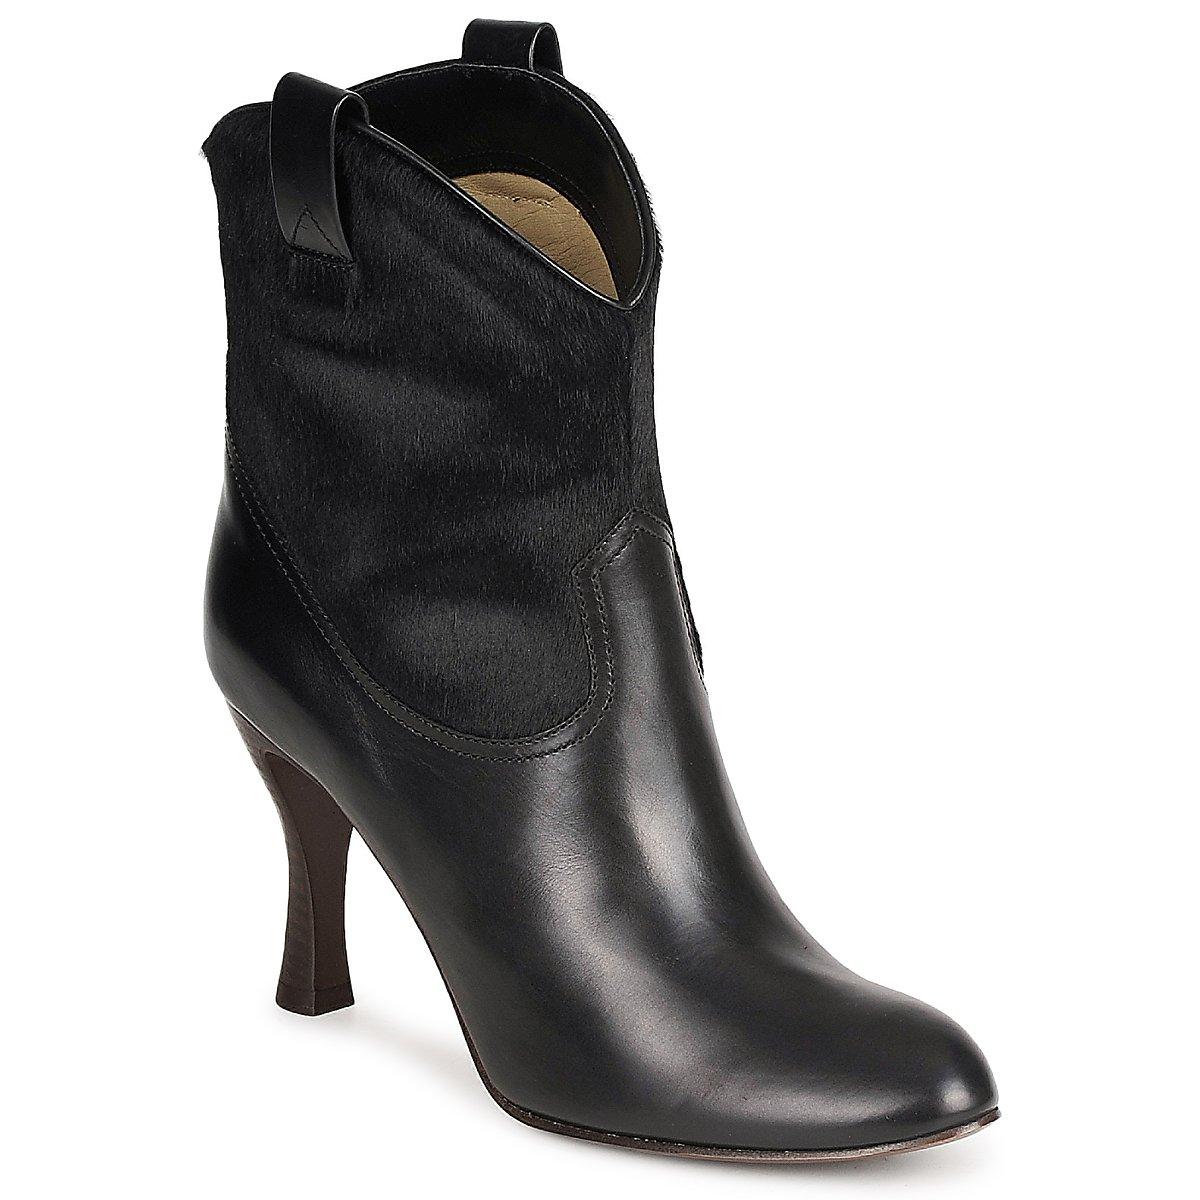 Marc Jacobs MJ19064 Schwarz - Kostenloser Versand bei Spartoode ! - Schuhe Low Boots Damen 344,50 €